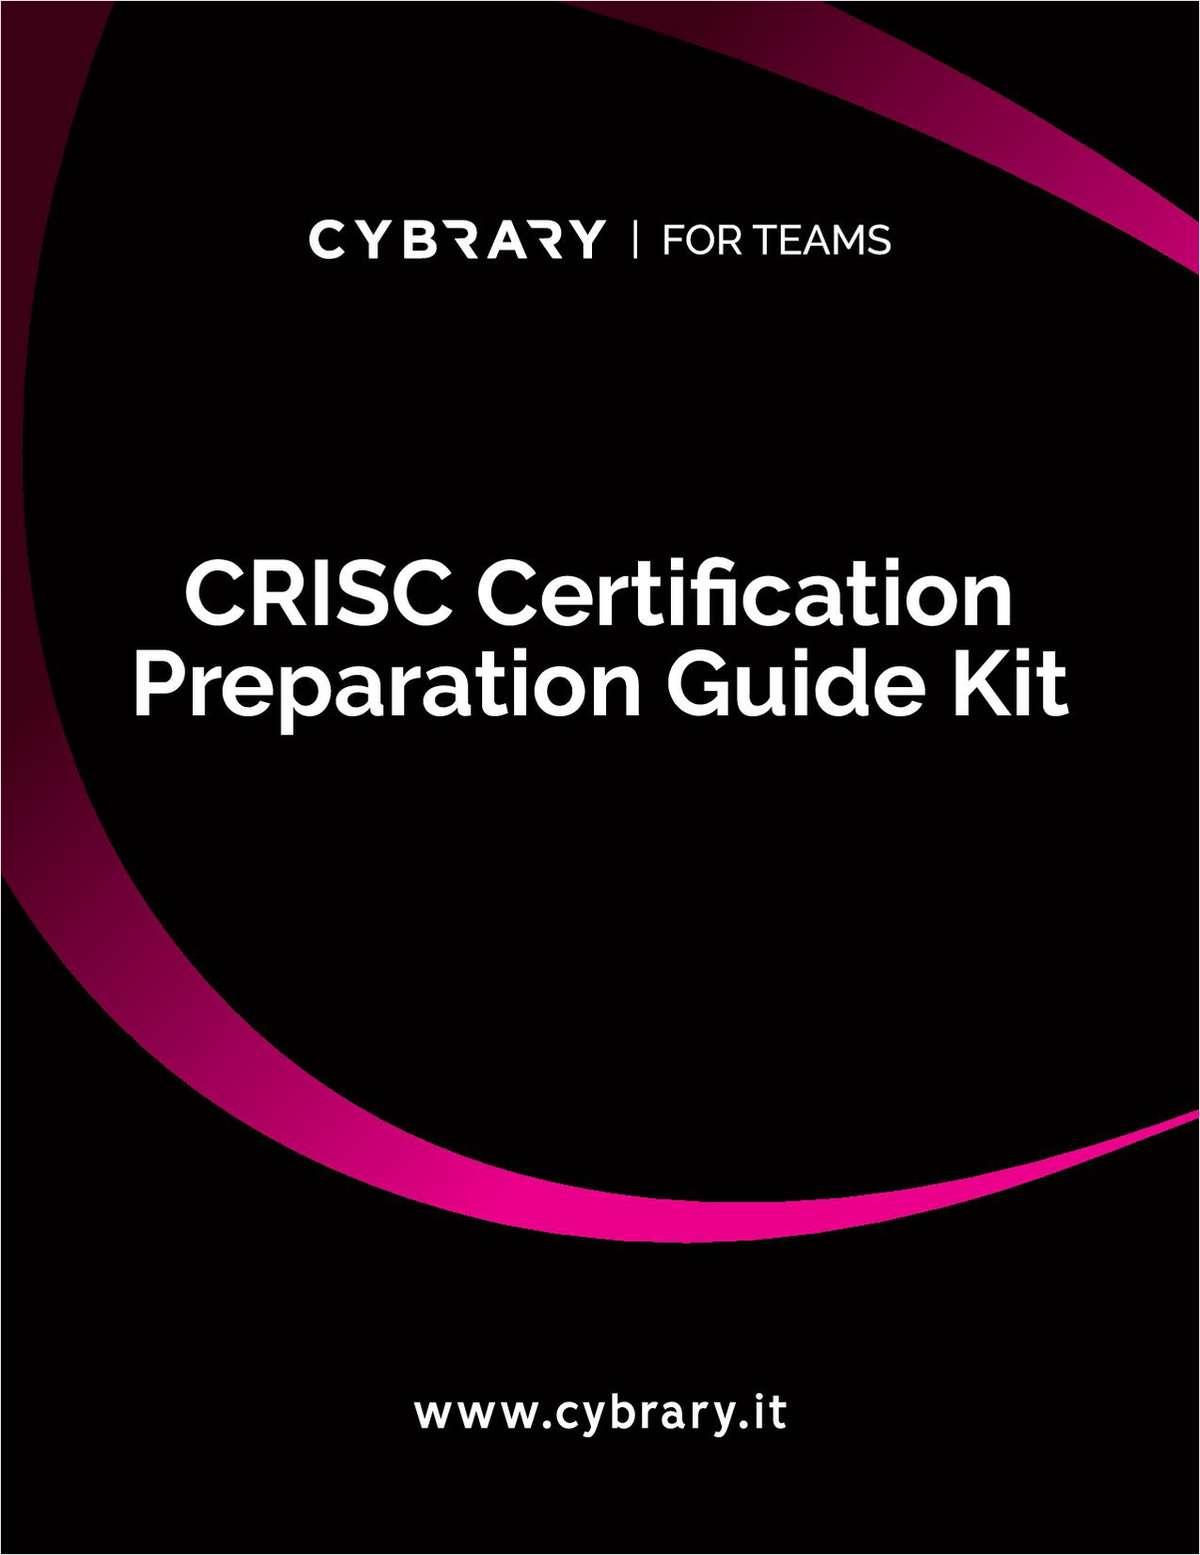 CRISC Certification Preparation Guide Kit